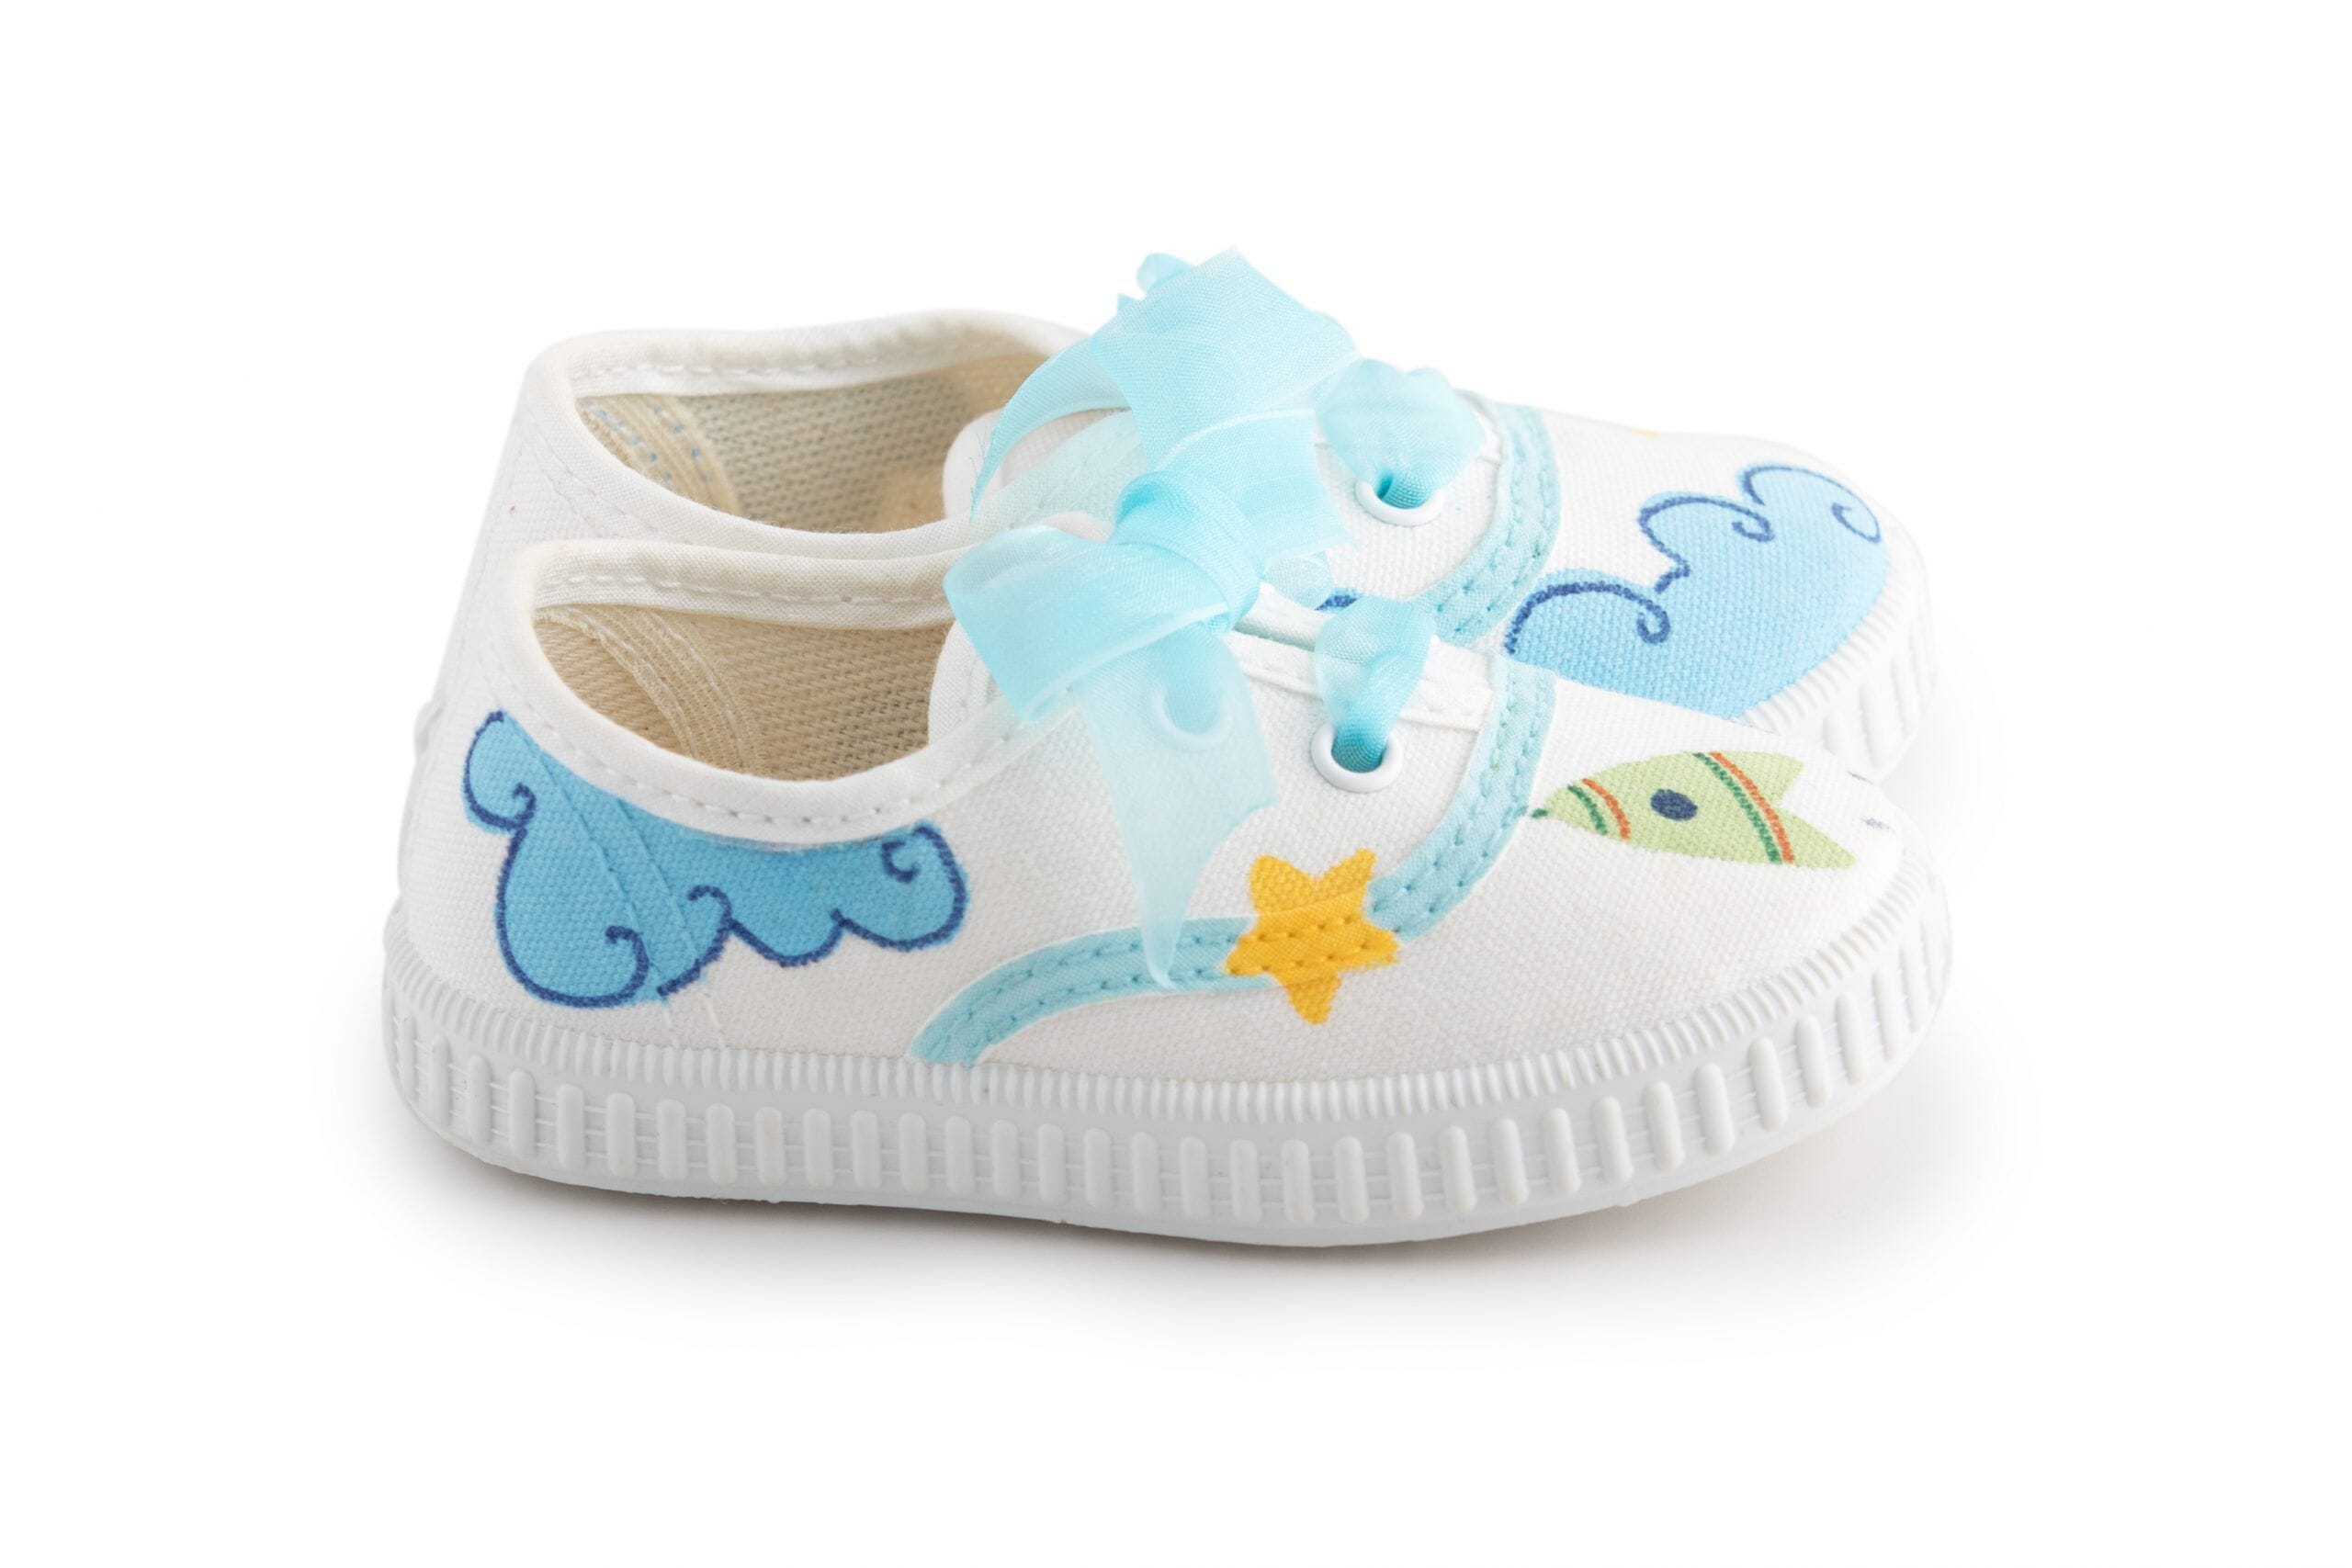 producto-ecommerce-calzado_4